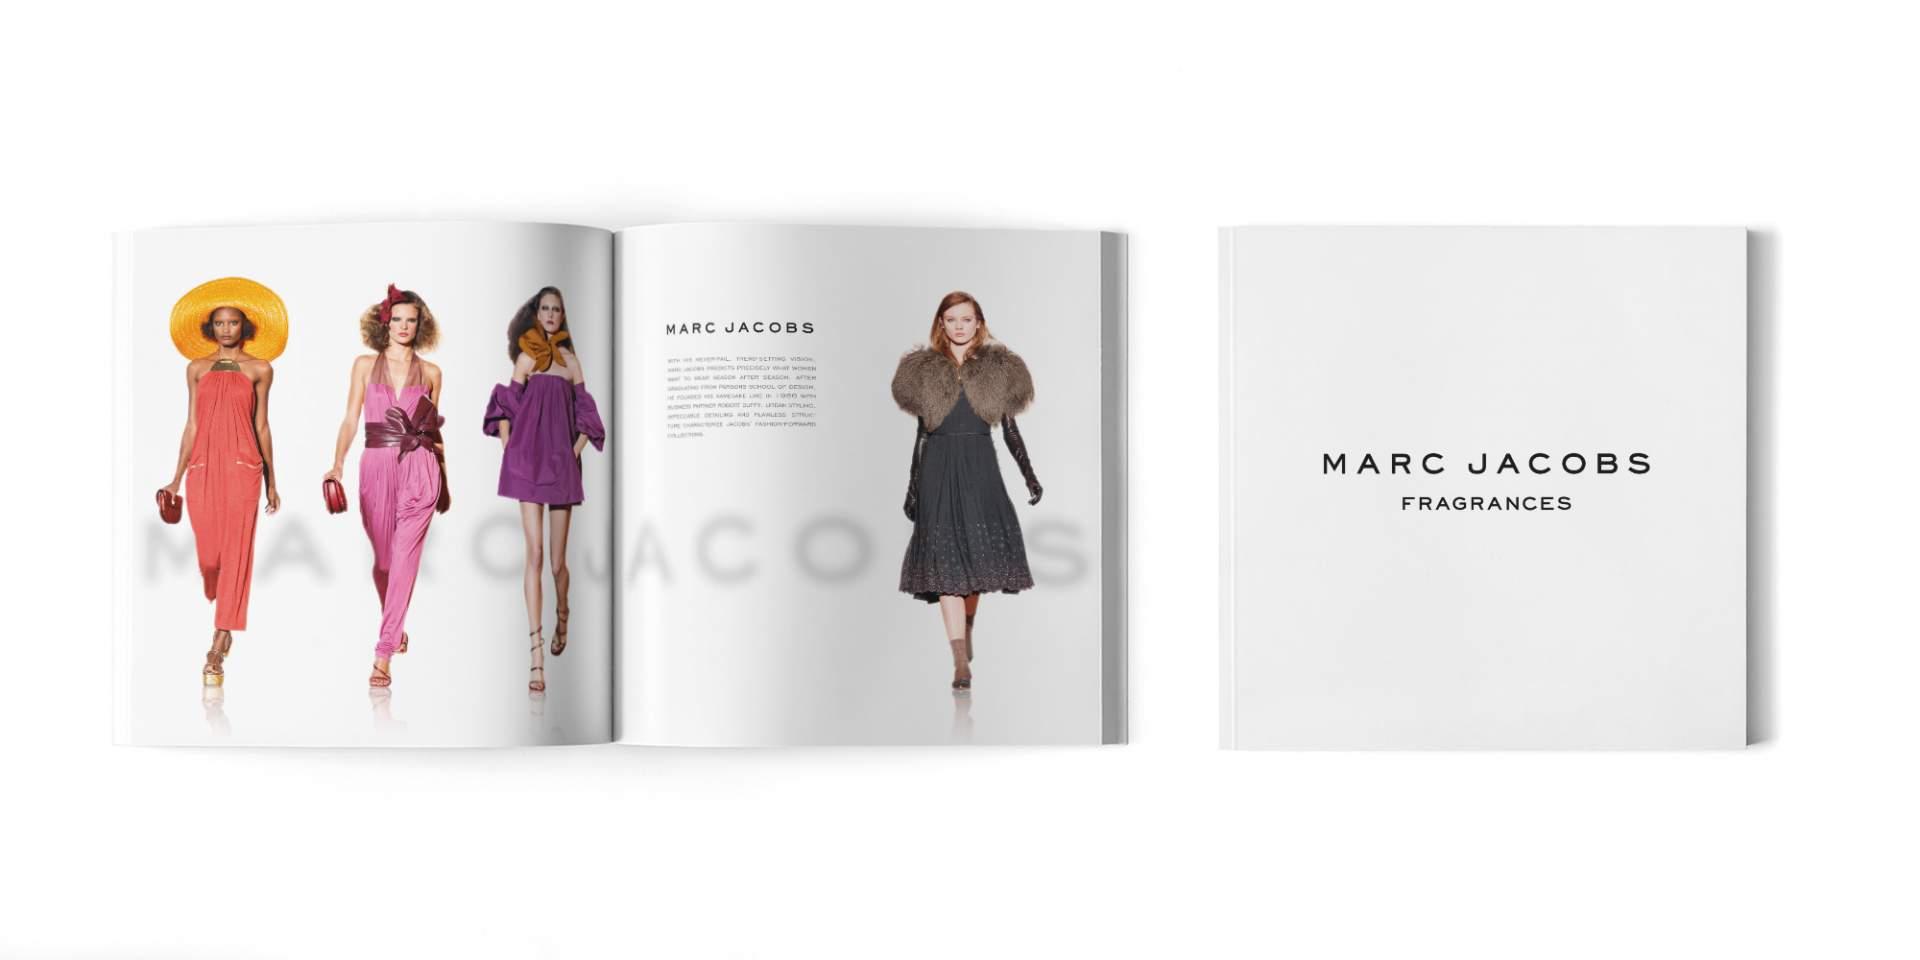 01-DA2 AGENCY - Marc Jacobs 03